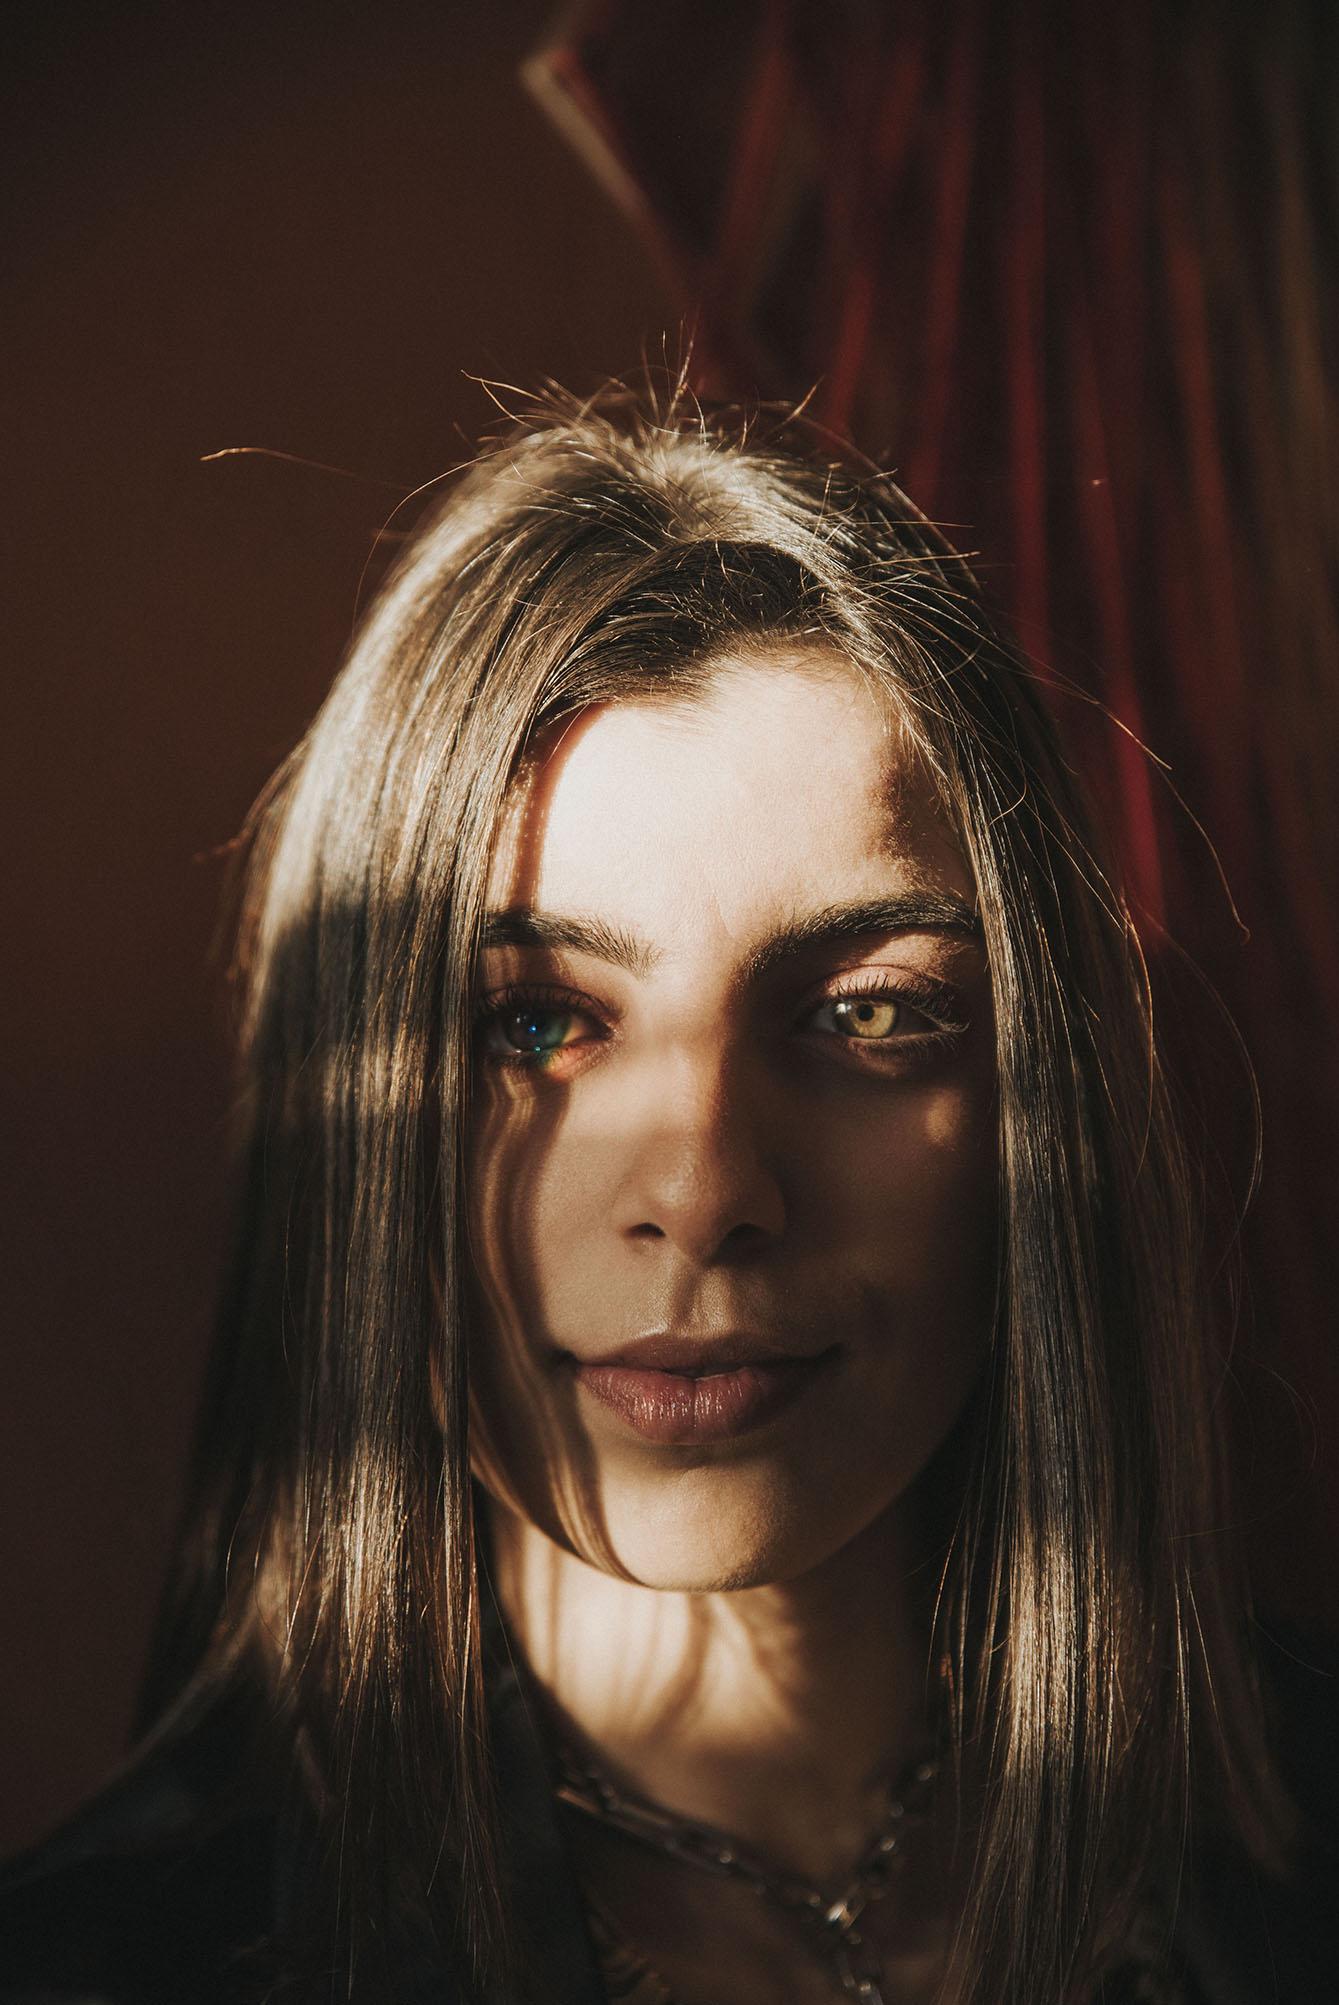 Ivania Silva